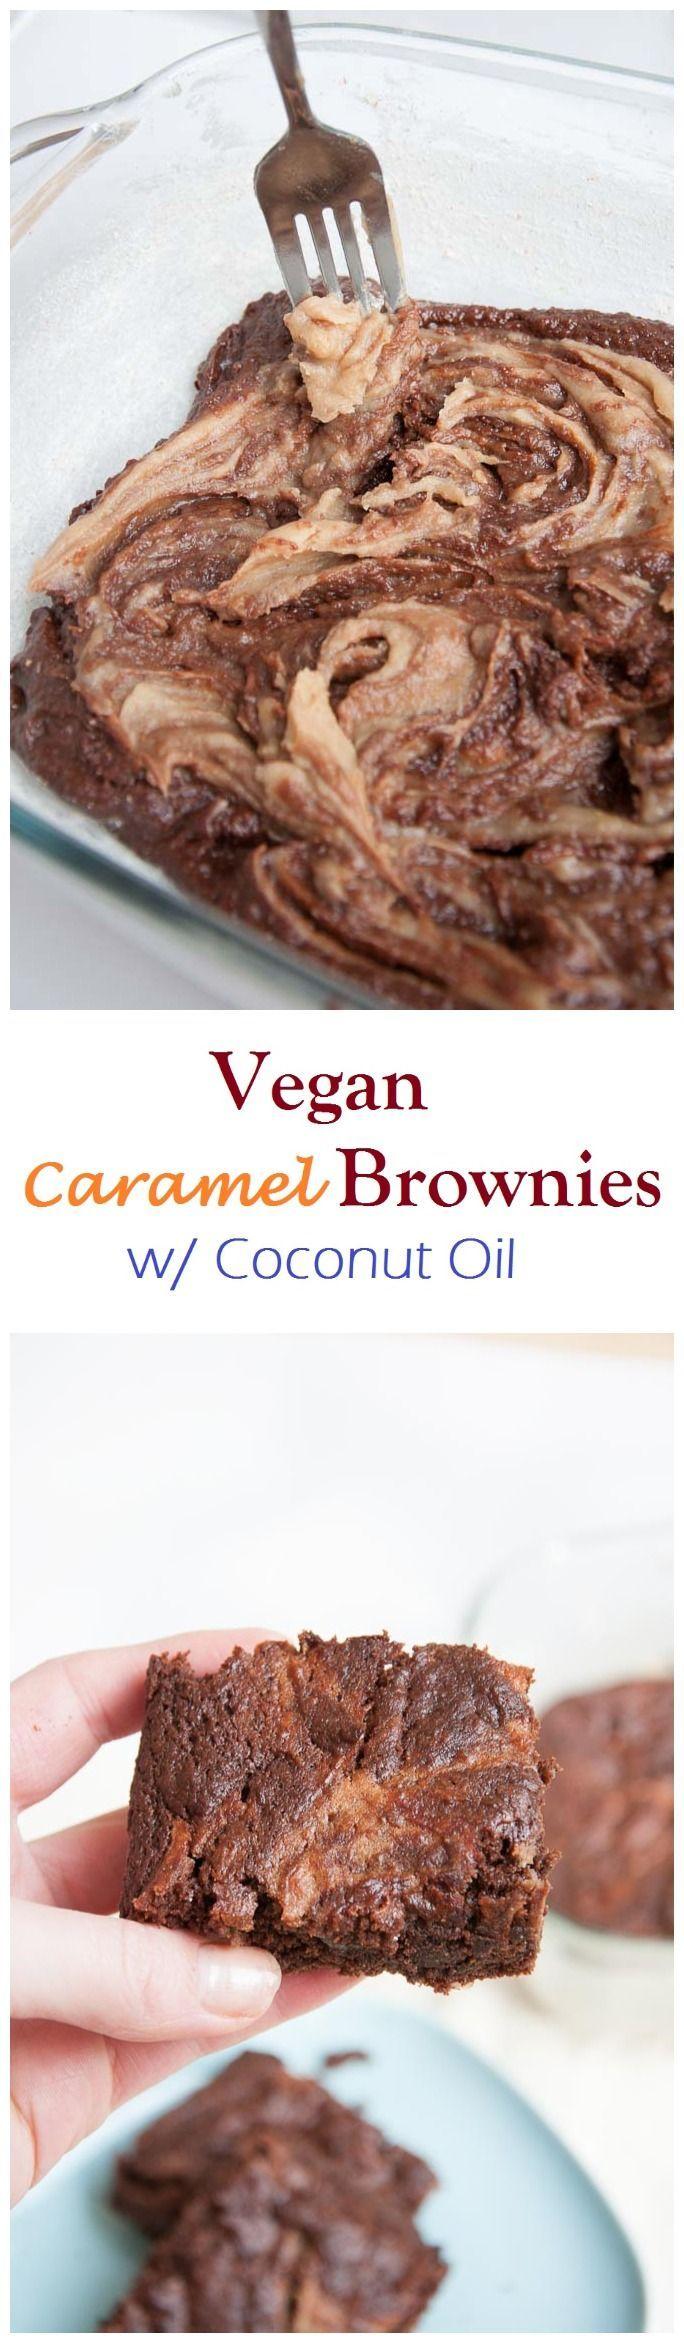 8 Ingredient Vegan Caramel Brownies Recipe w/ Coconut Oil and Homemade Raw Date Caramel | use gf flour